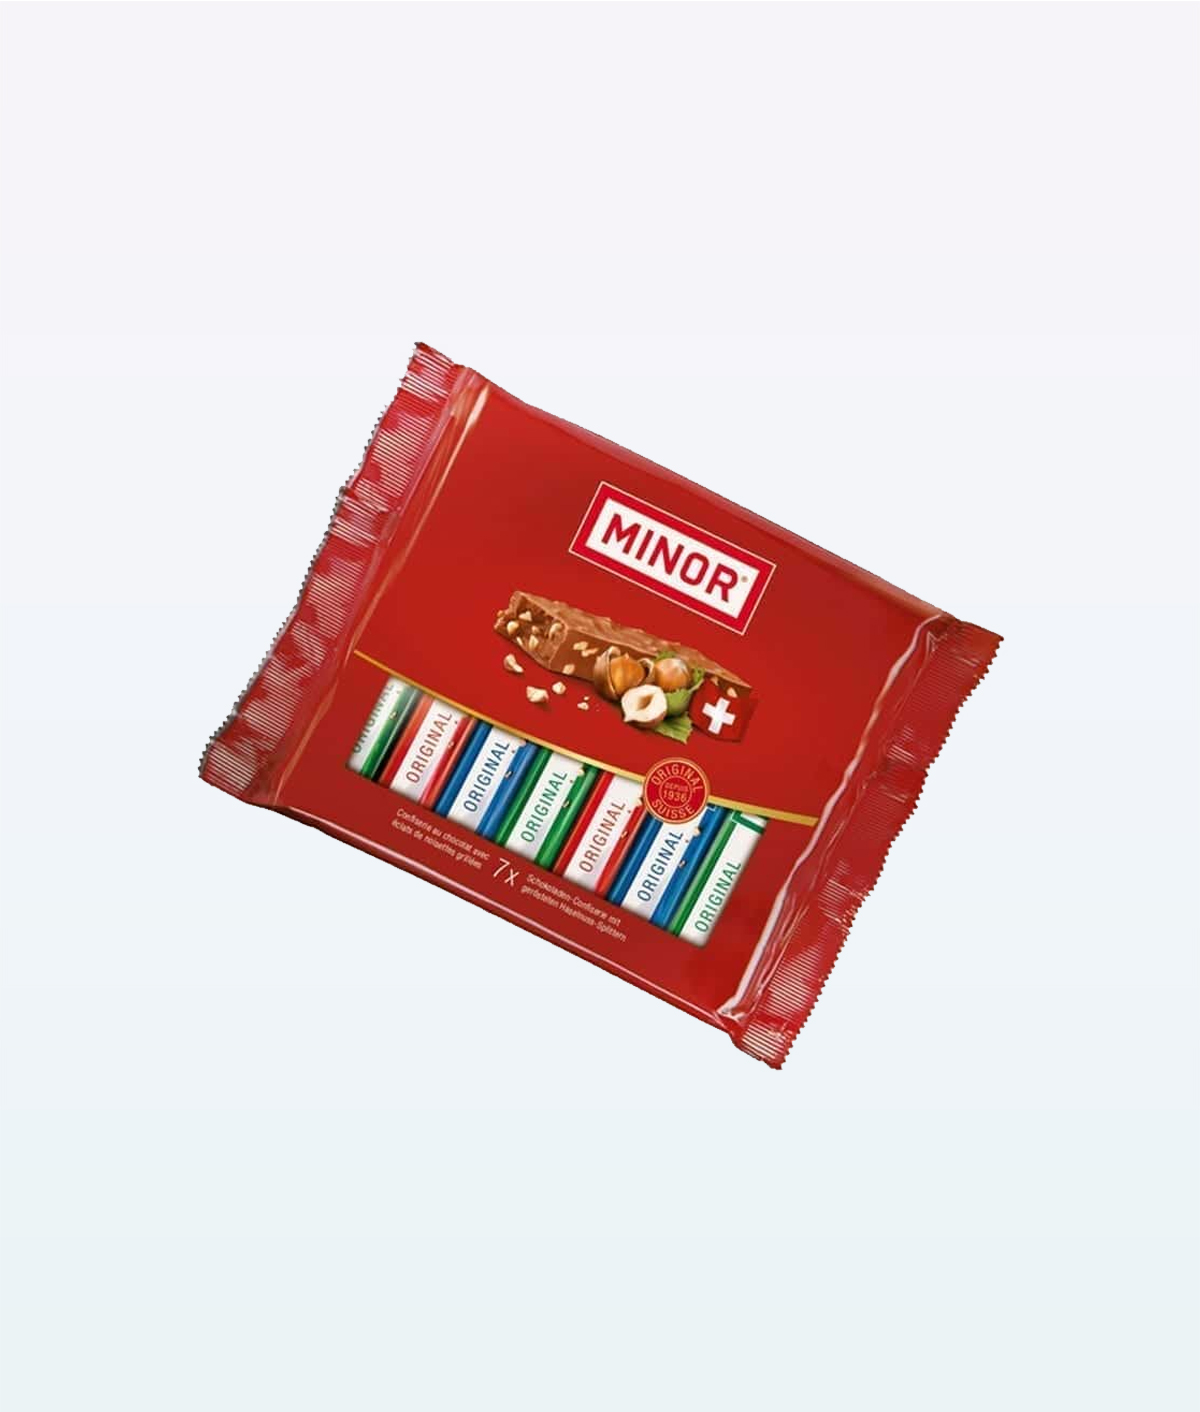 Minor-7-Bar-Chocolate